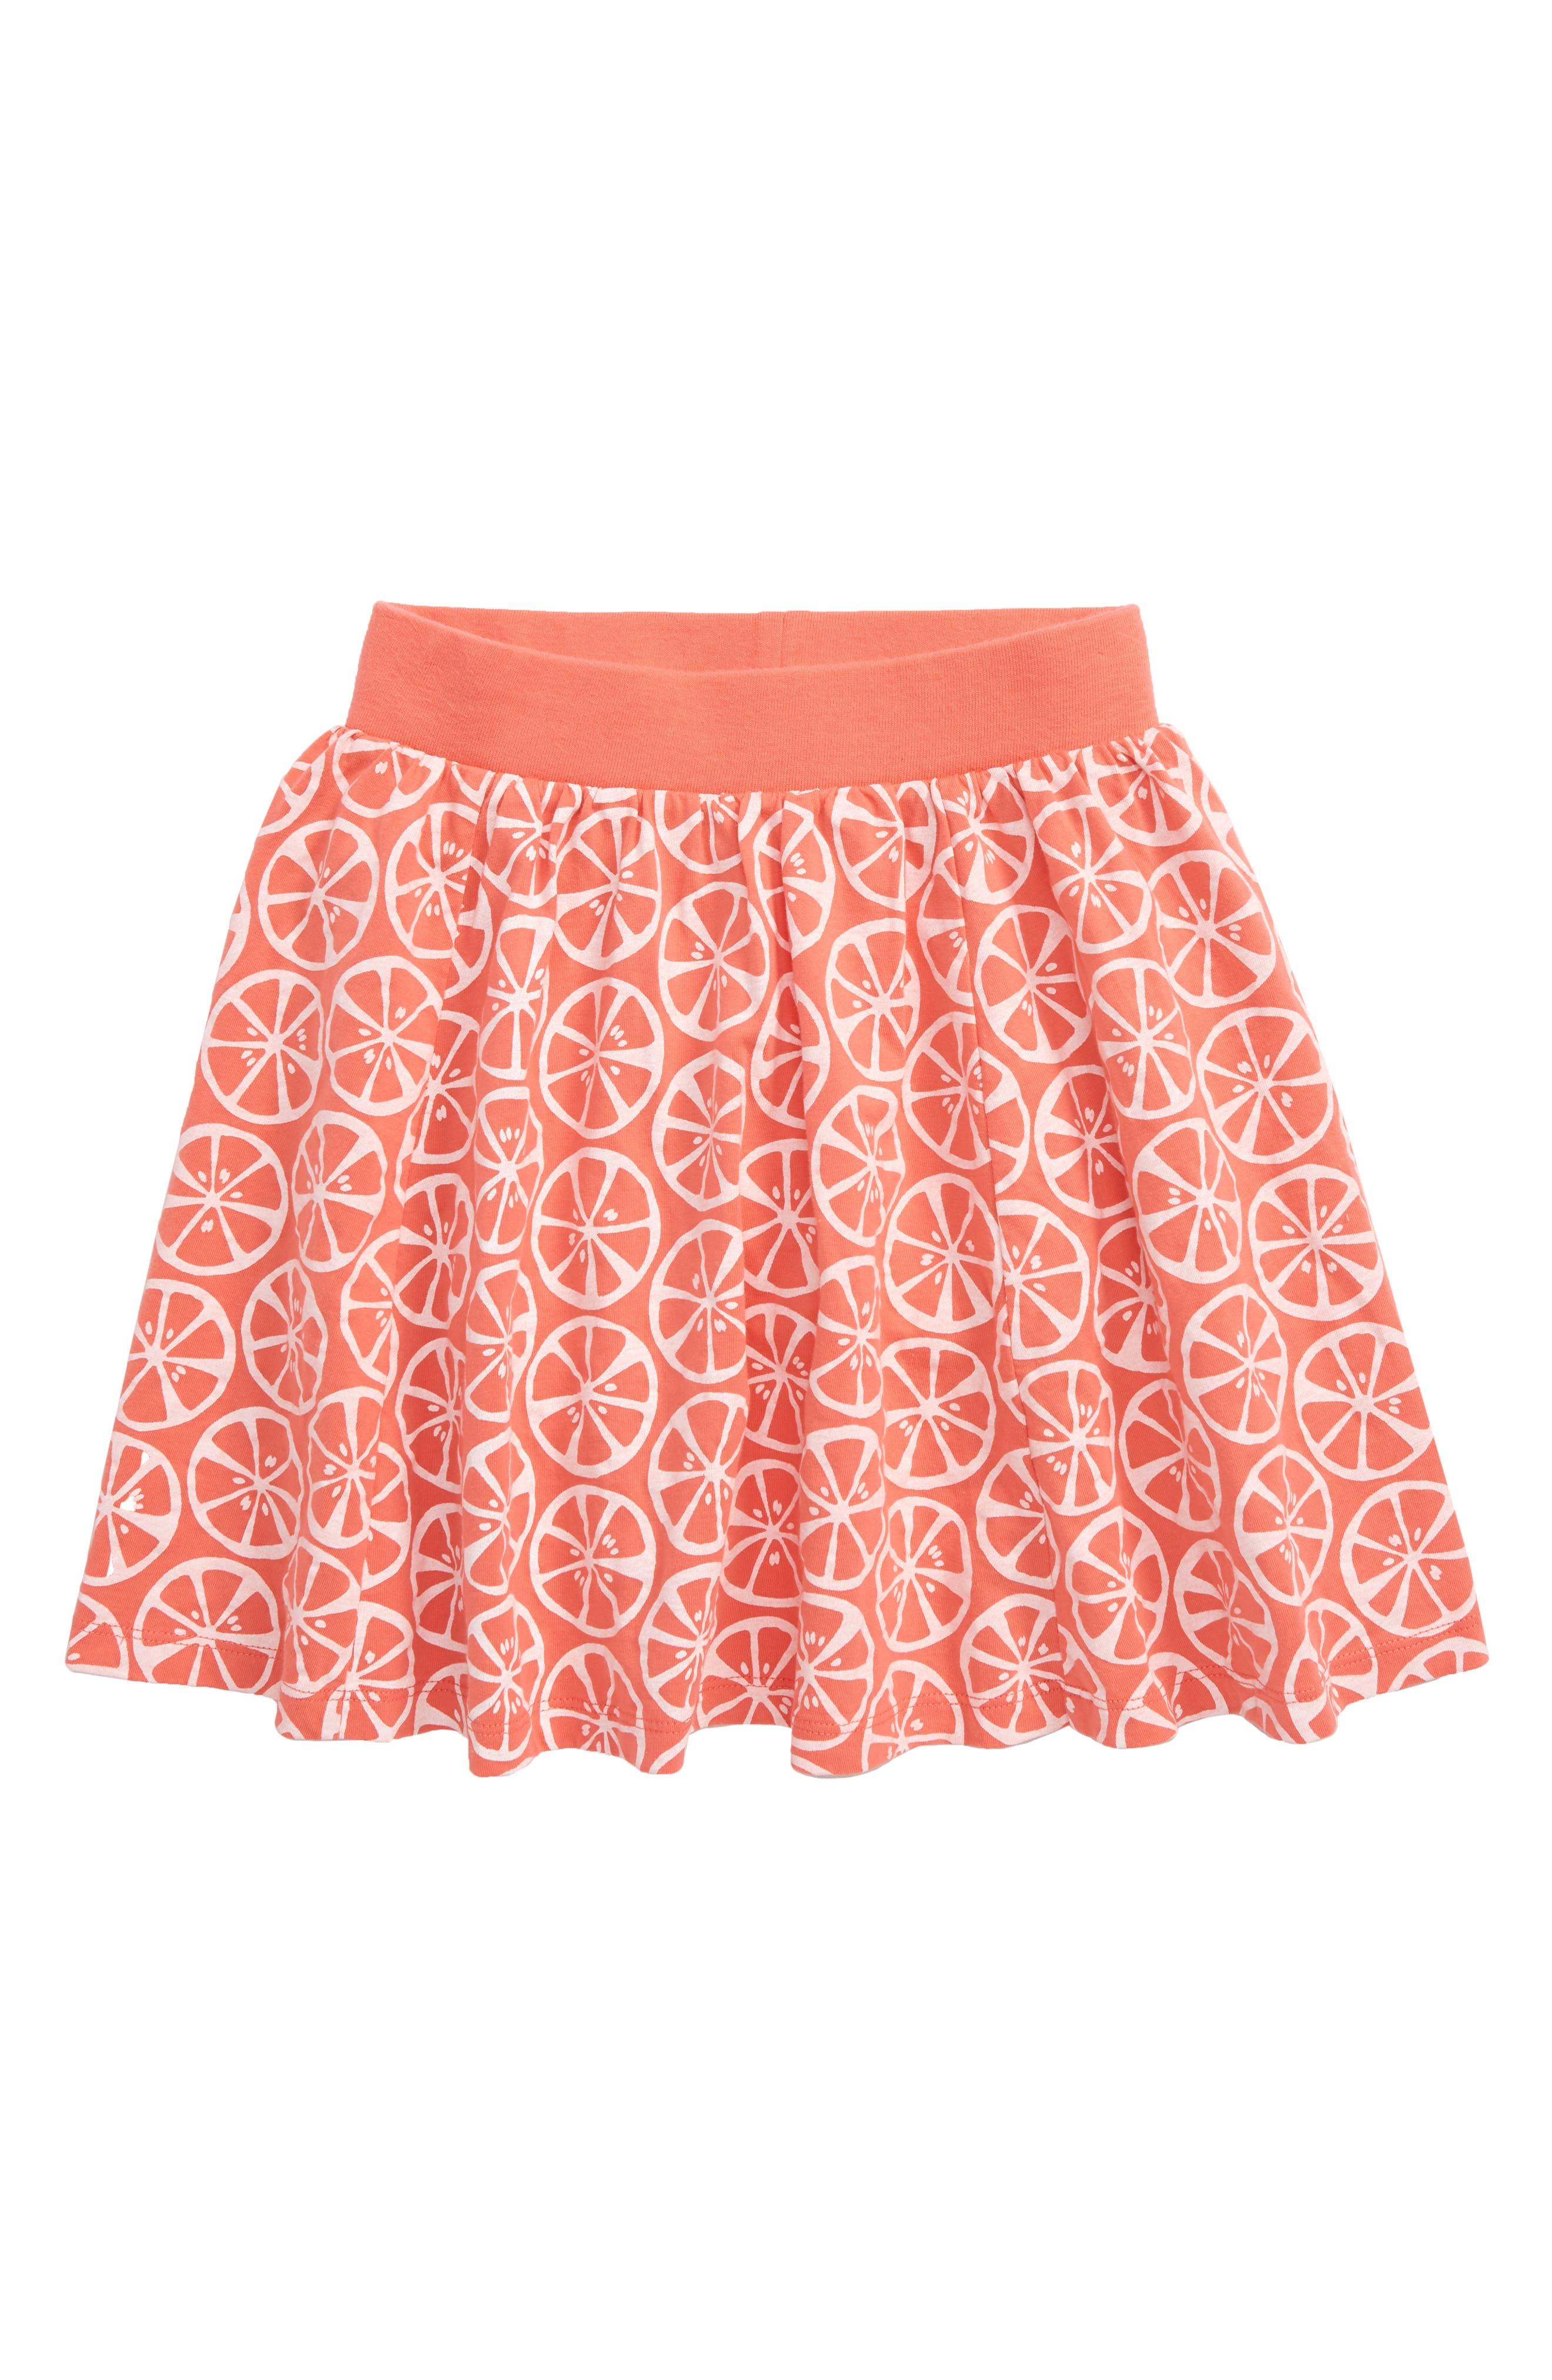 Toddler Girls Tea Collection Print Twirl Skort Size 3T  Orange